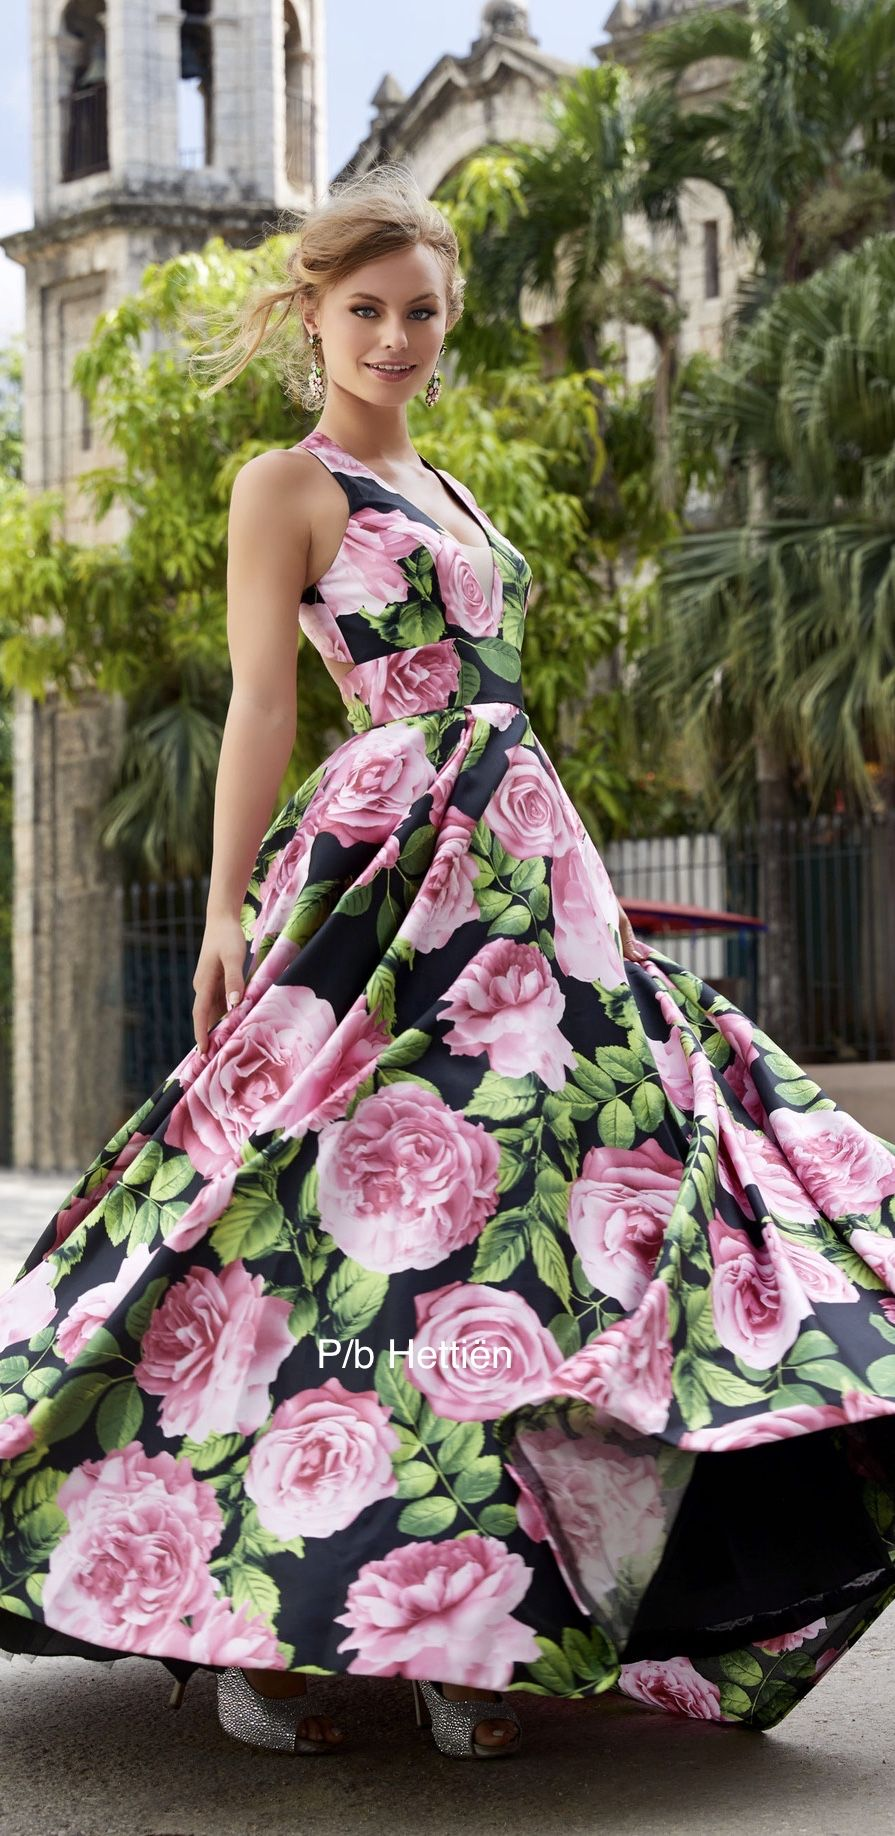 Pin By Hettien On Lavish Long Dresses Mori Lee Prom Dresses Prom Dresses Dresses [ 1836 x 895 Pixel ]